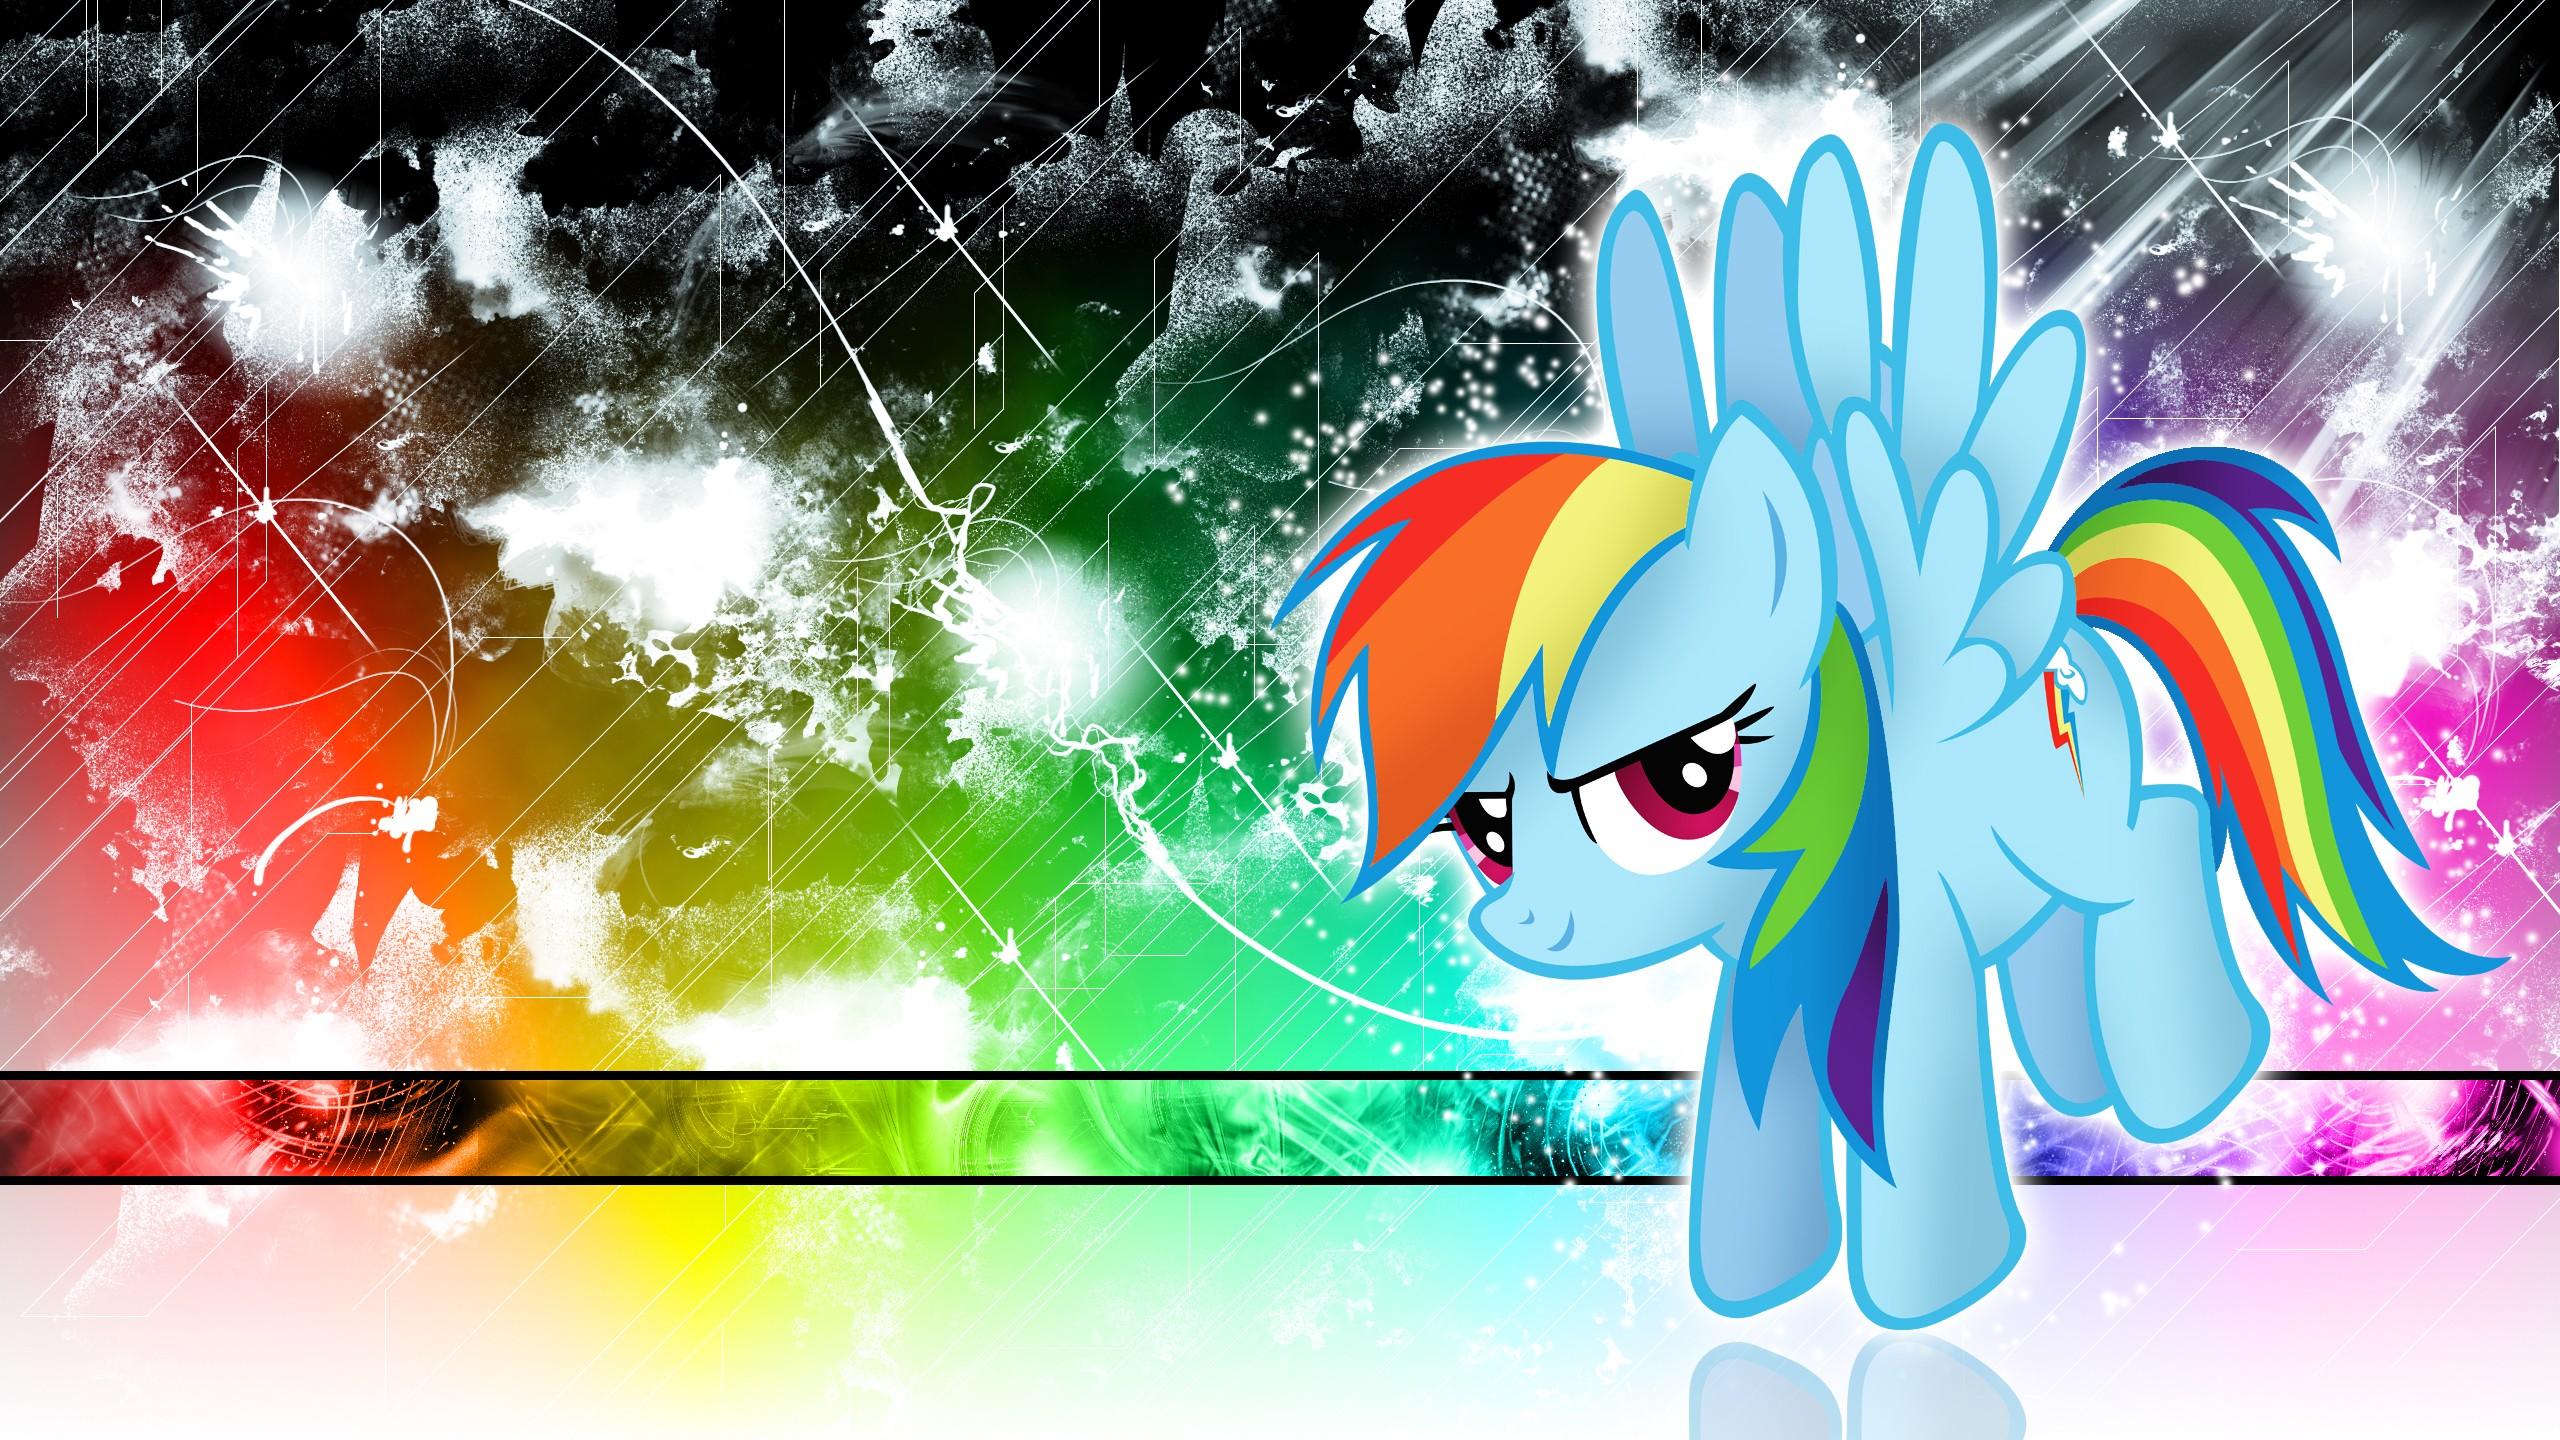 Обои На Рабочий Стол Rainbow